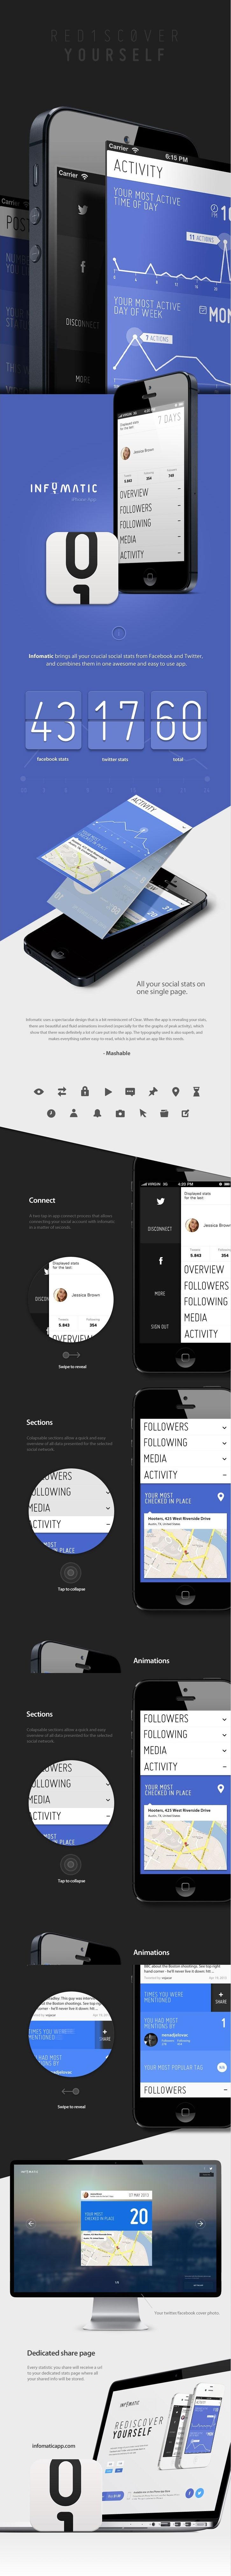 Infomatic iPhone App